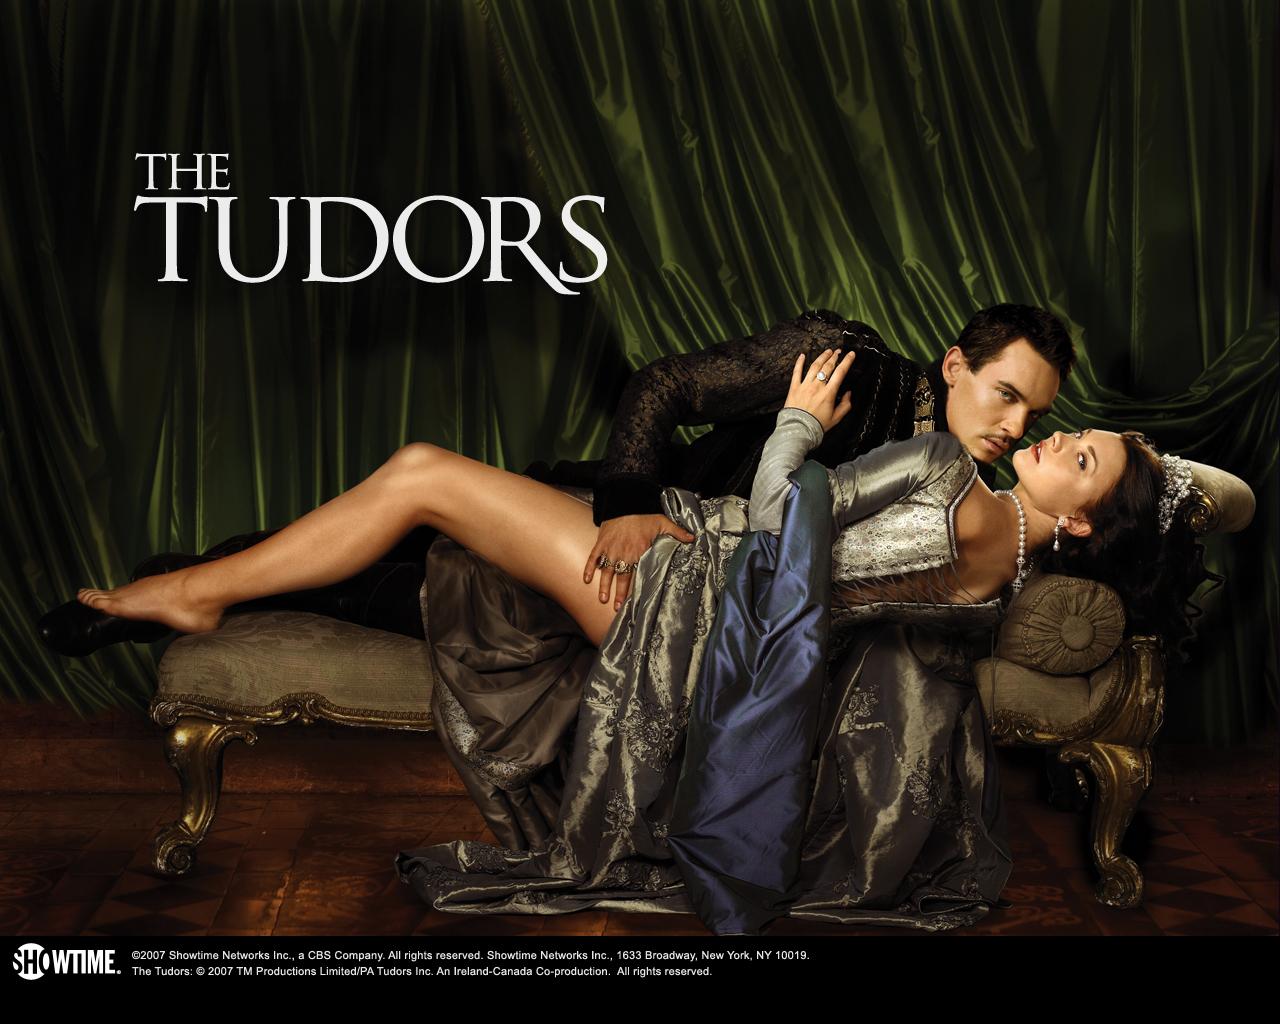 http://4.bp.blogspot.com/_ktpxbQsto34/TRpzaqivZiI/AAAAAAAAAfQ/QMFtKMDSkaY/s1600/Jonathan_Rhys_Meyers_in_The_Tudors_Wallpaper_2_1280.jpg